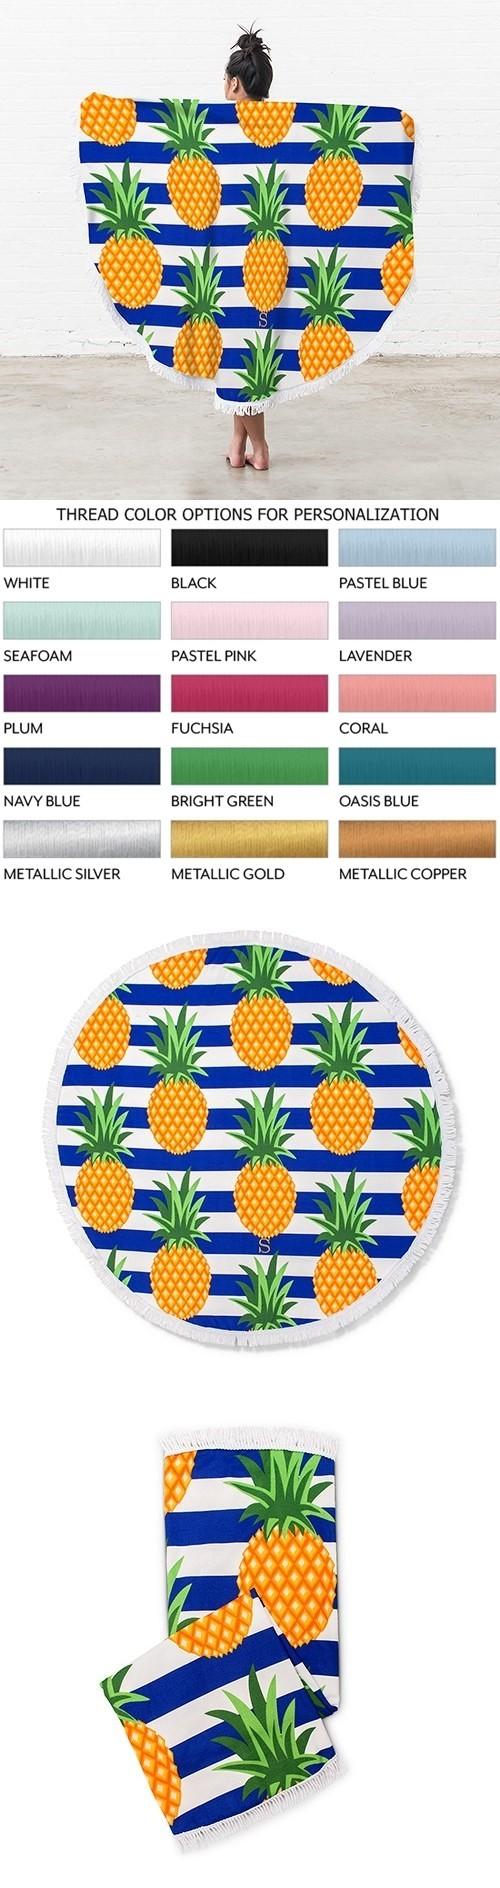 Weddingstar Personalizable Pineapple Motif Round Beach Towel